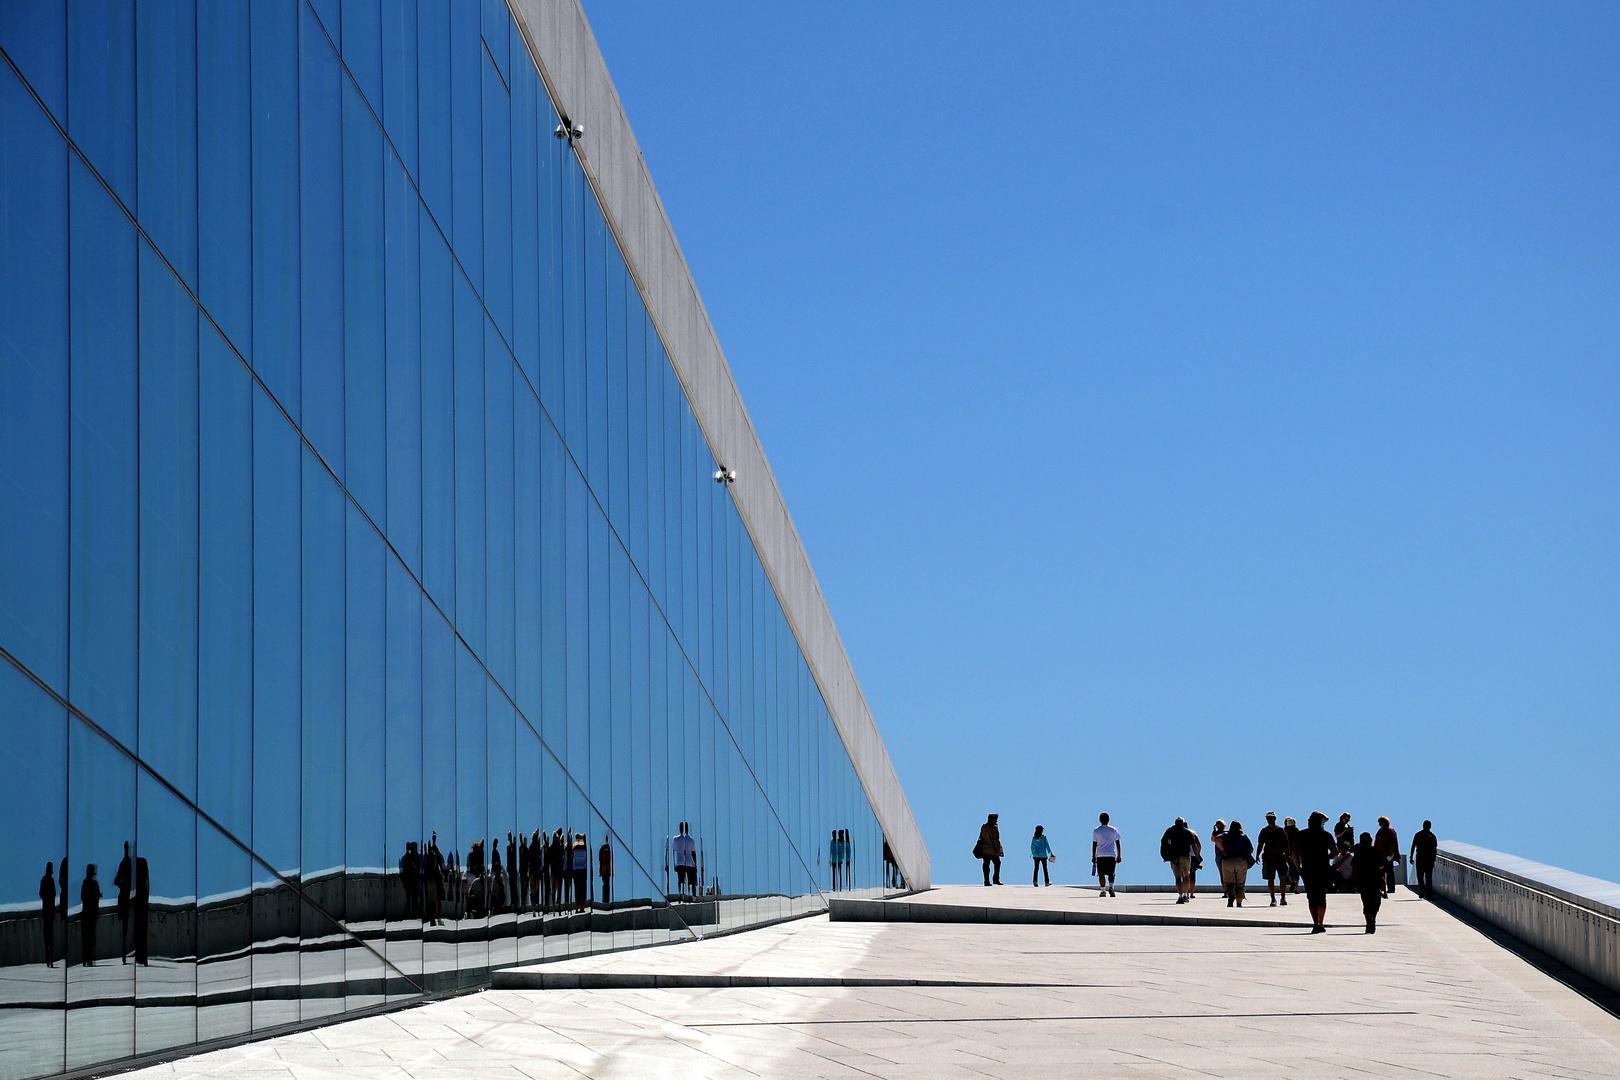 New Operahouse in Oslo